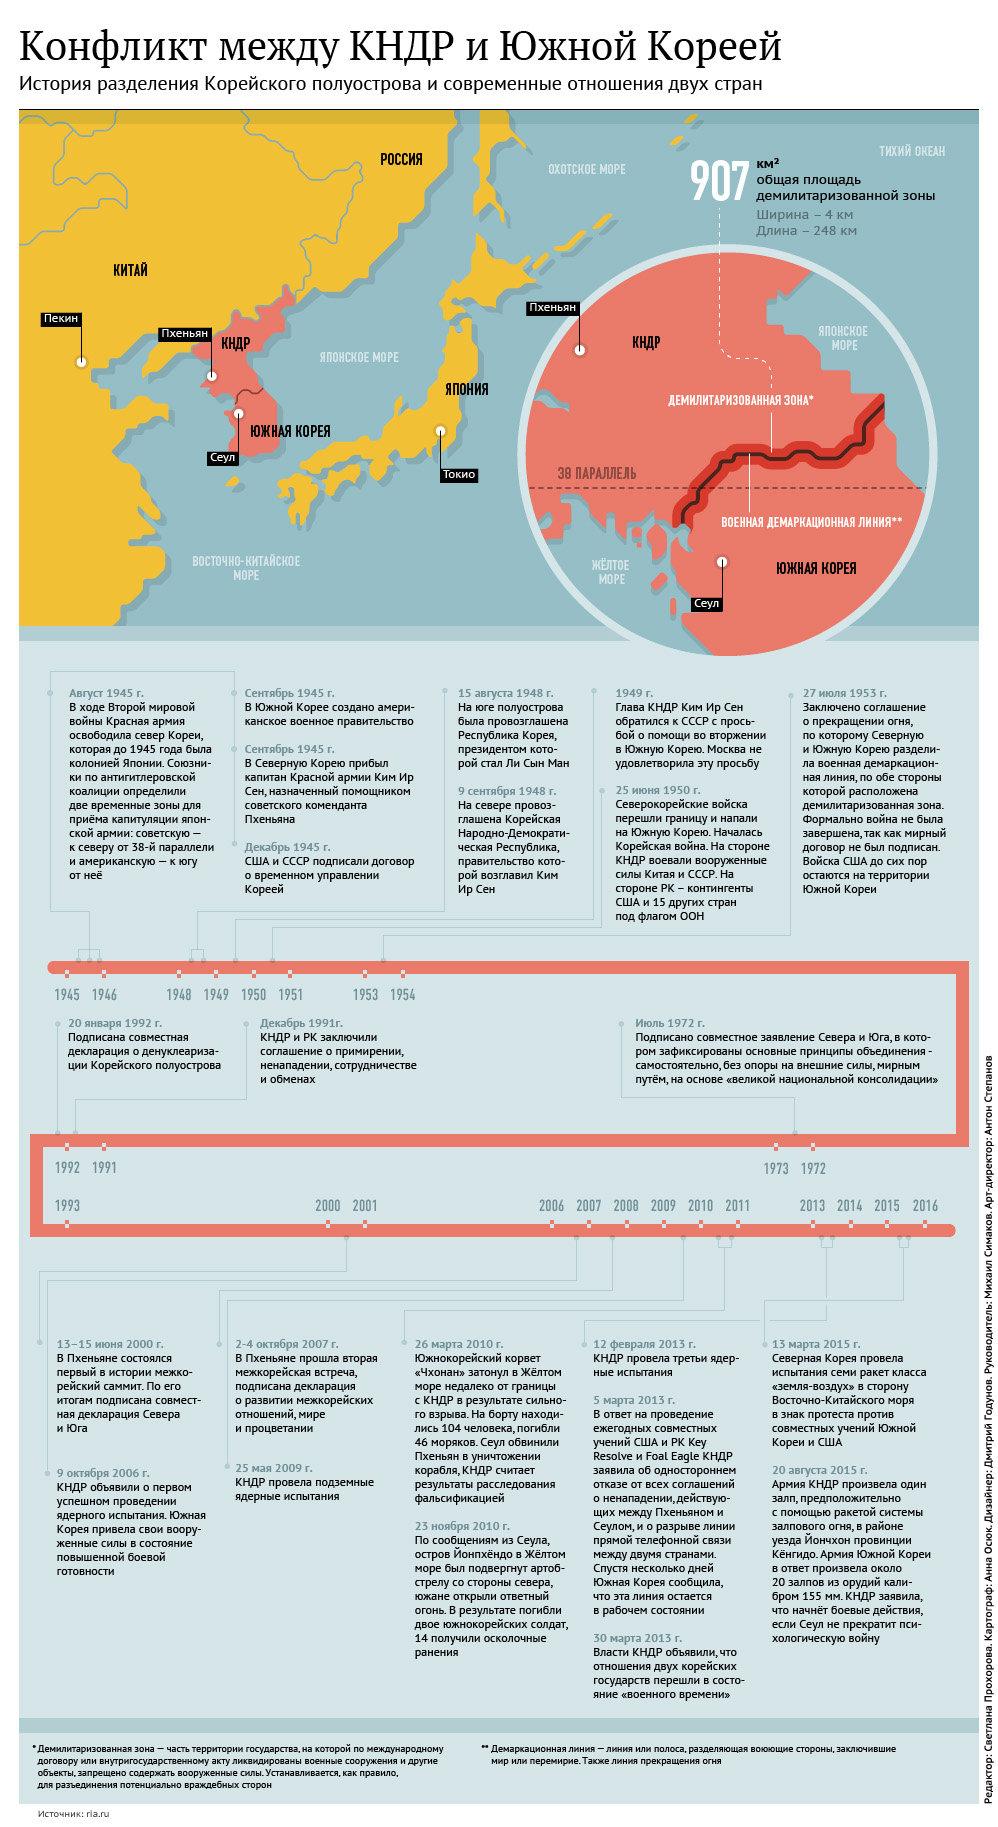 Конфликт между КНДР и Южной Кореей - Sputnik Таджикистан